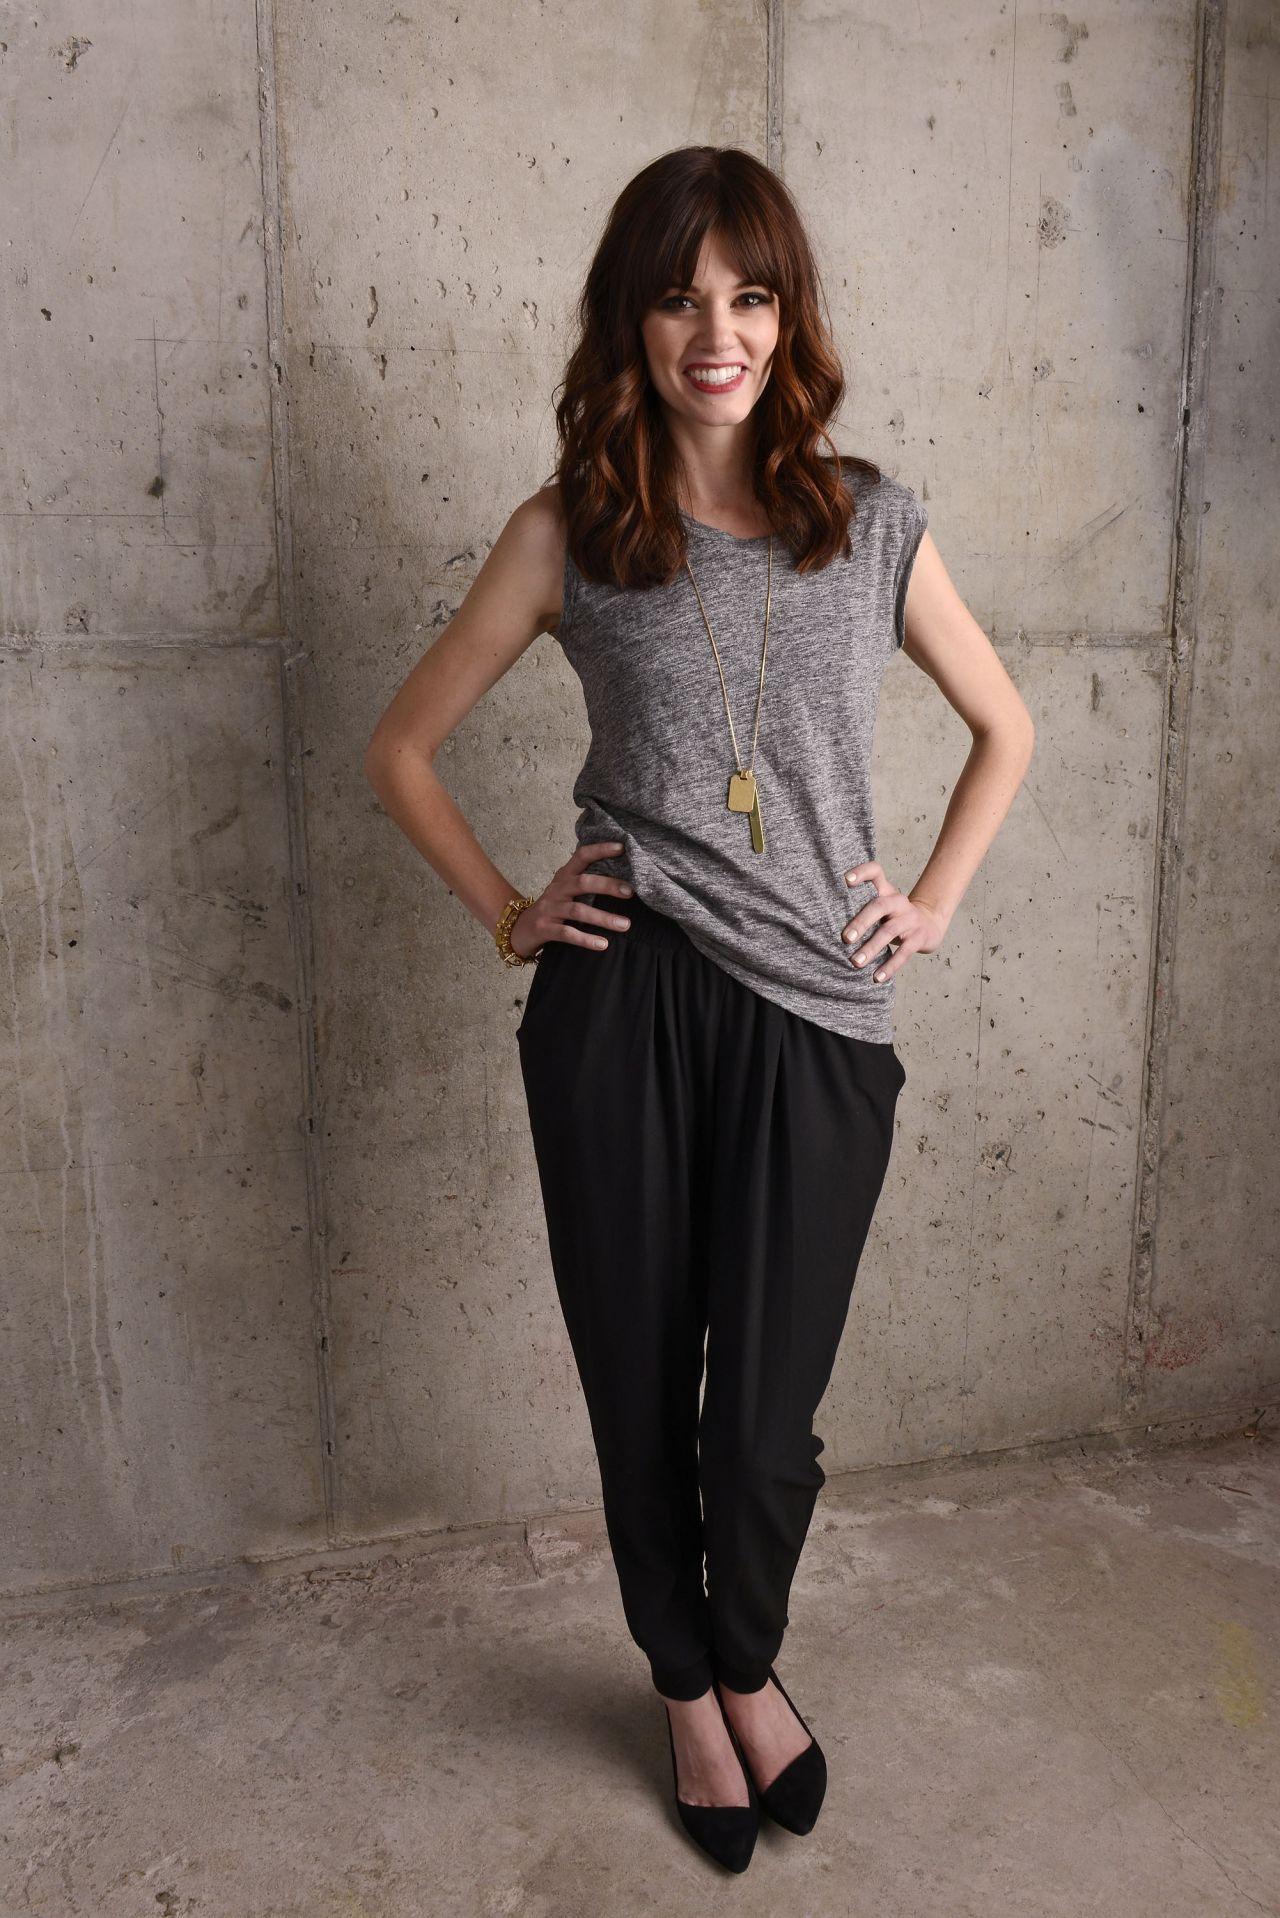 Rachel Melvin Zombeavers 2014 Tribeca Film Festival